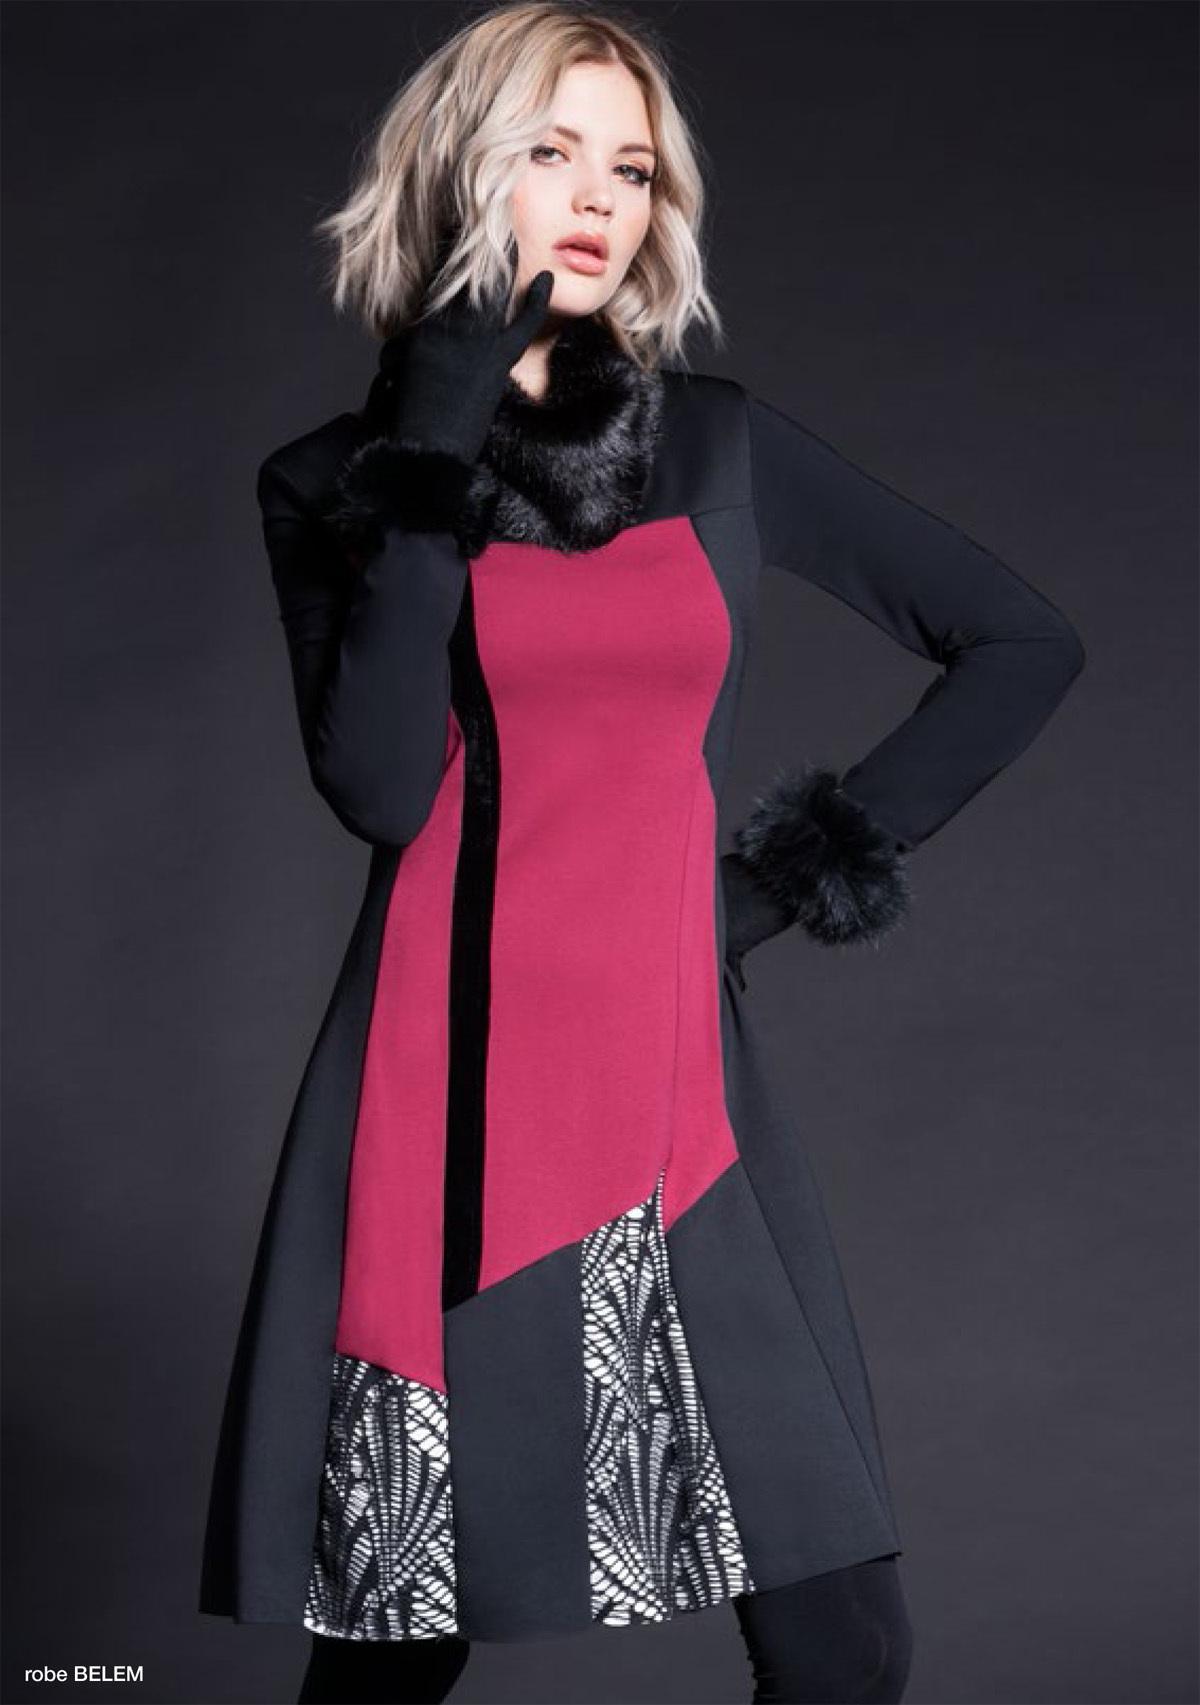 Maloka: Colored Diamond Twist Dress (More Colors!) MK_BRIDGET_N7